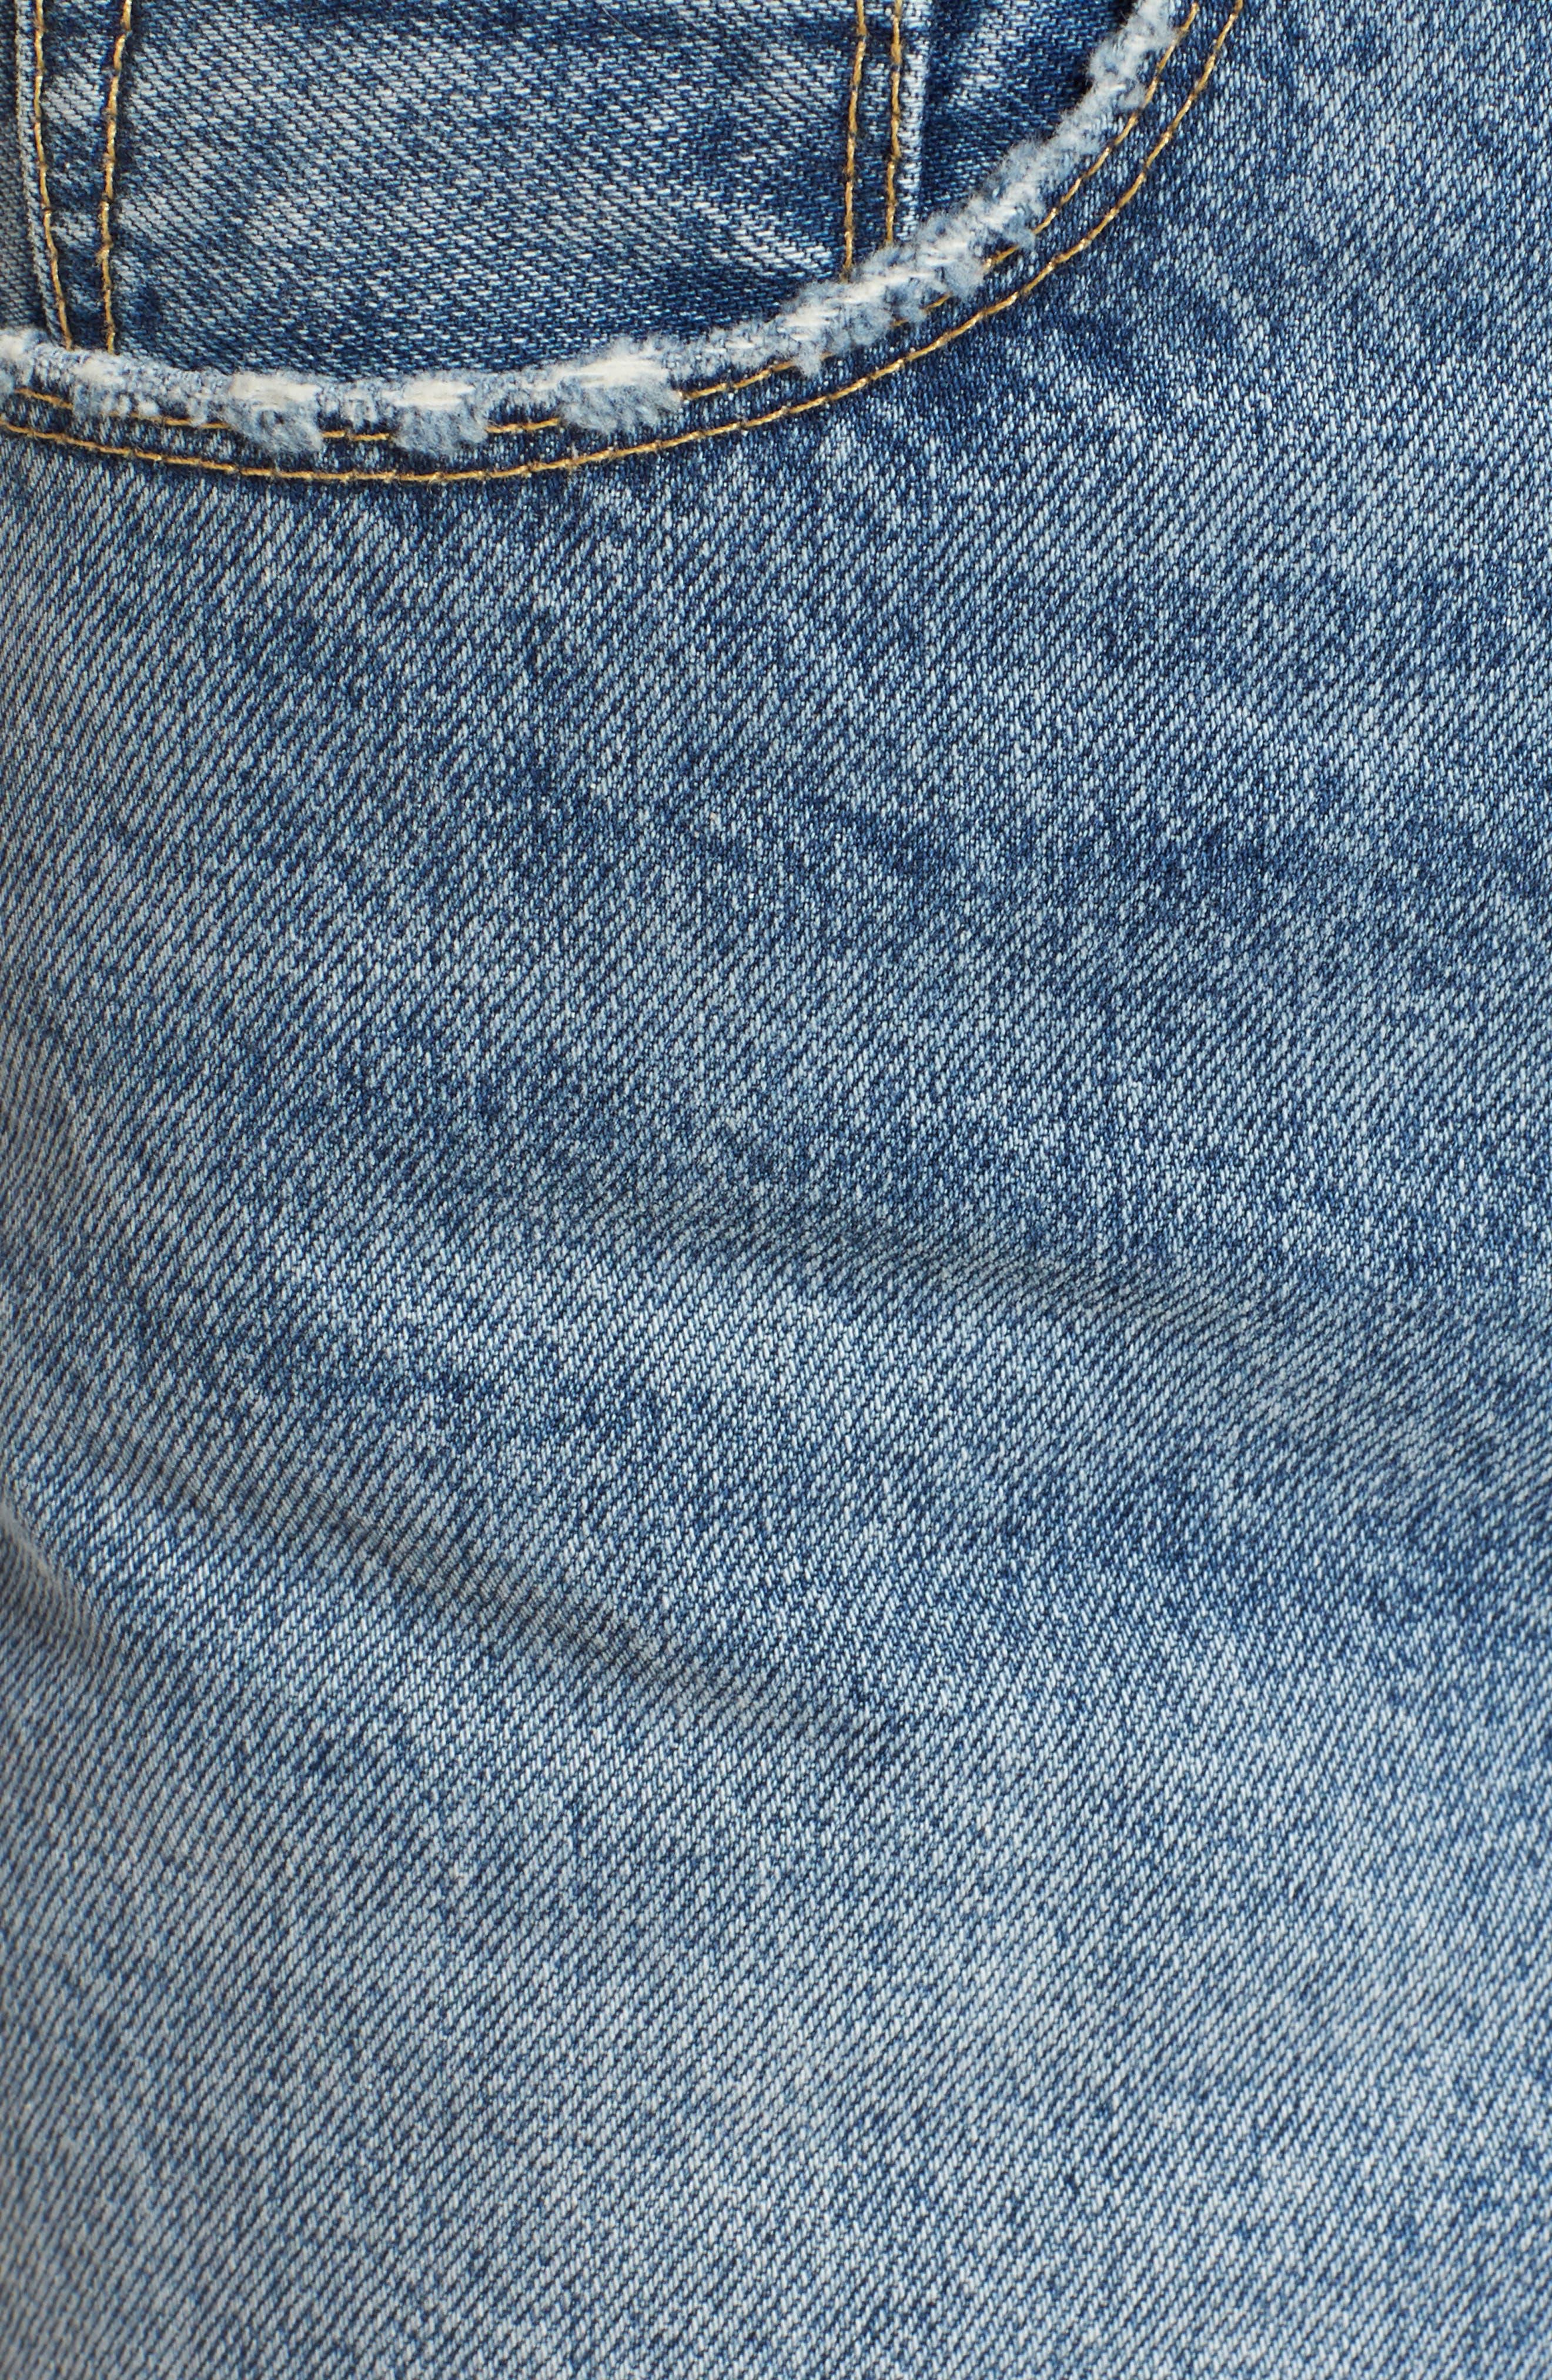 High Waist Cutoff Denim Shorts,                             Alternate thumbnail 6, color,                             420